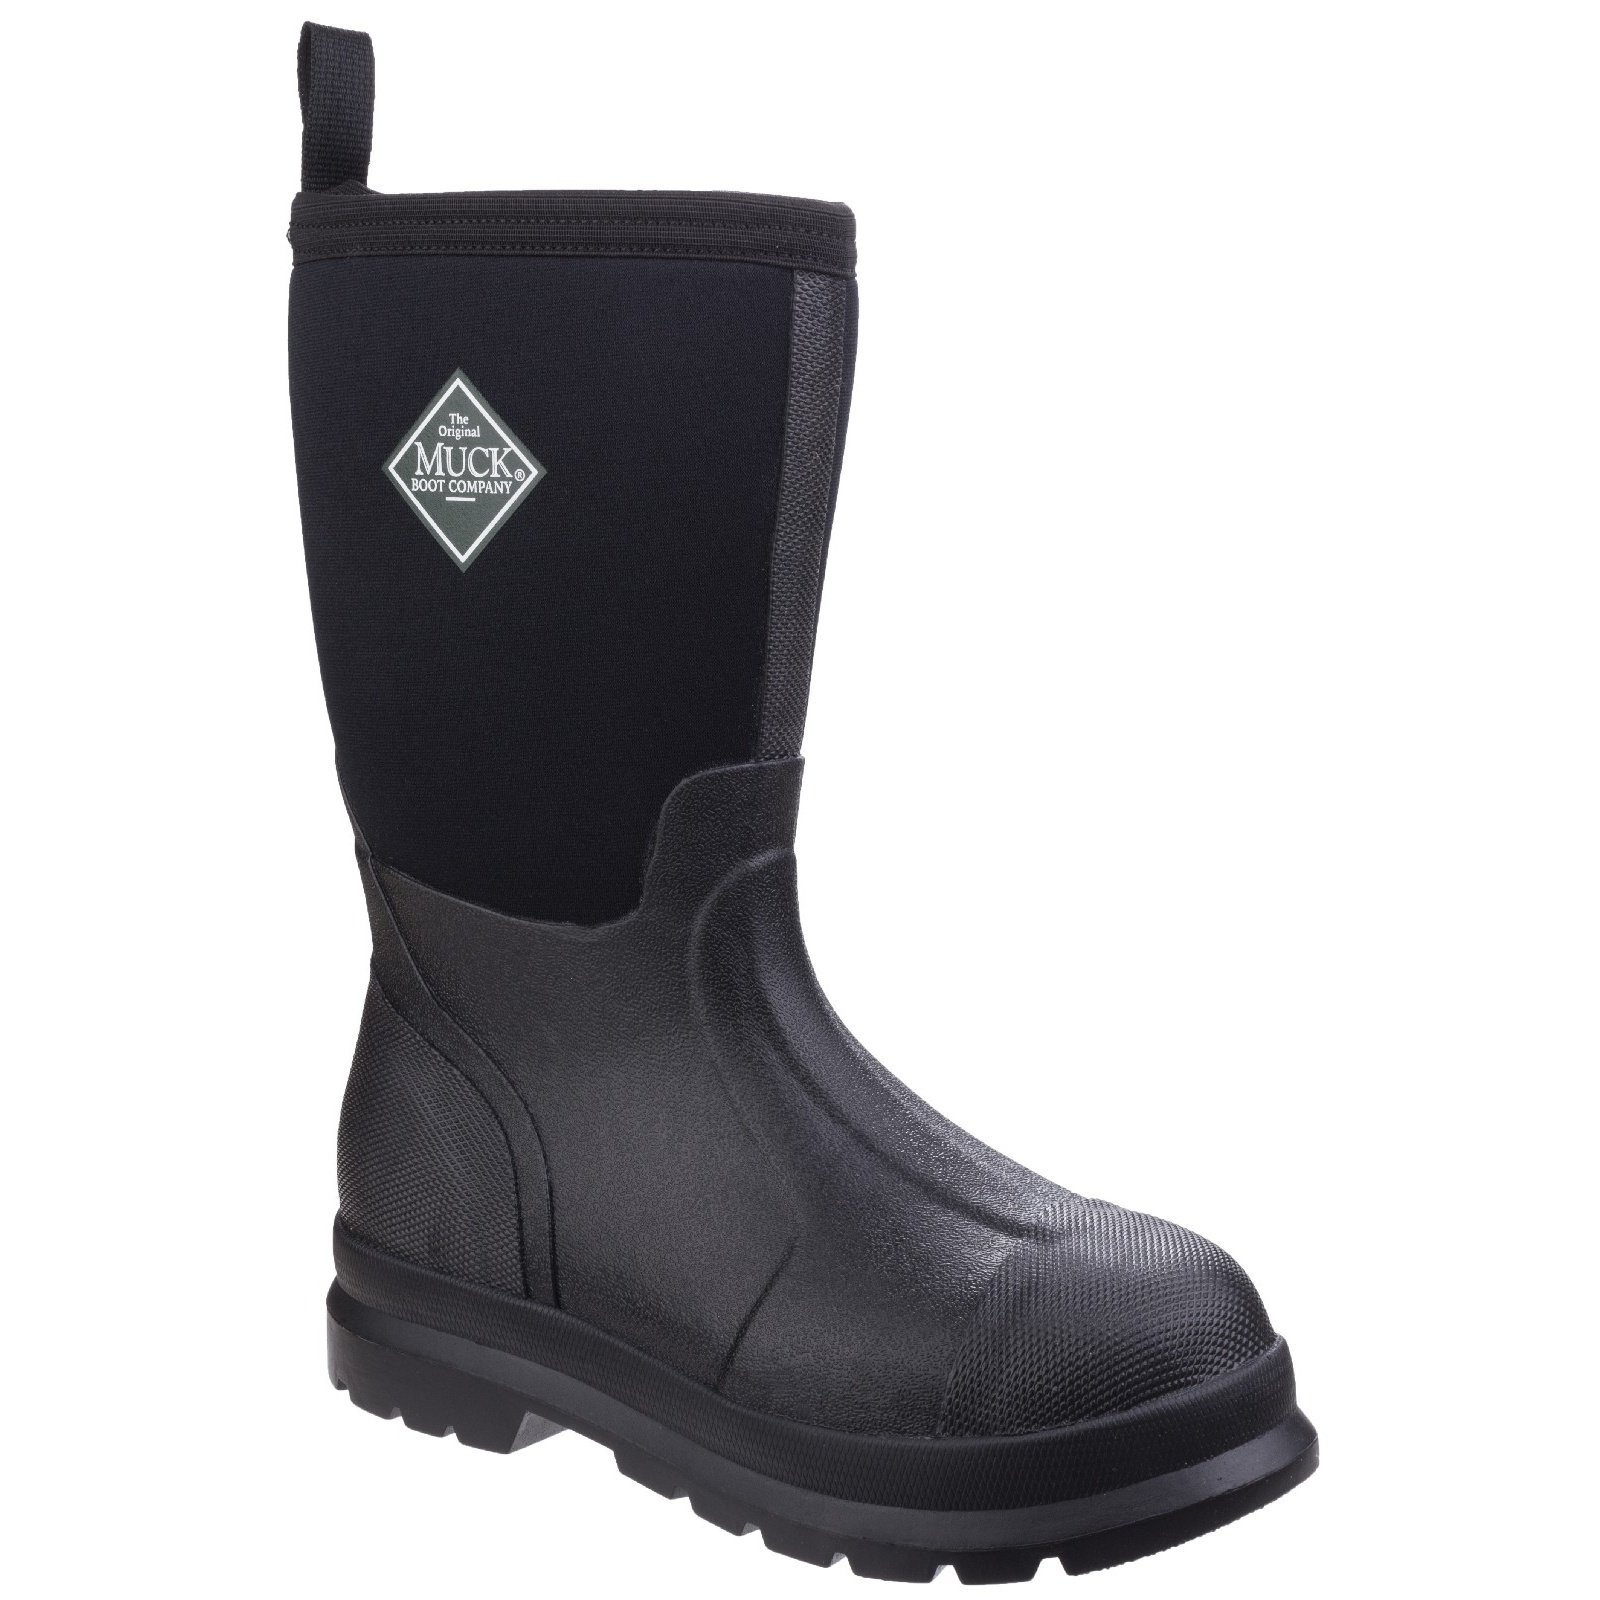 Muck Boot Childrens/Kids Chore Wellington Boots (2 US) (Black)